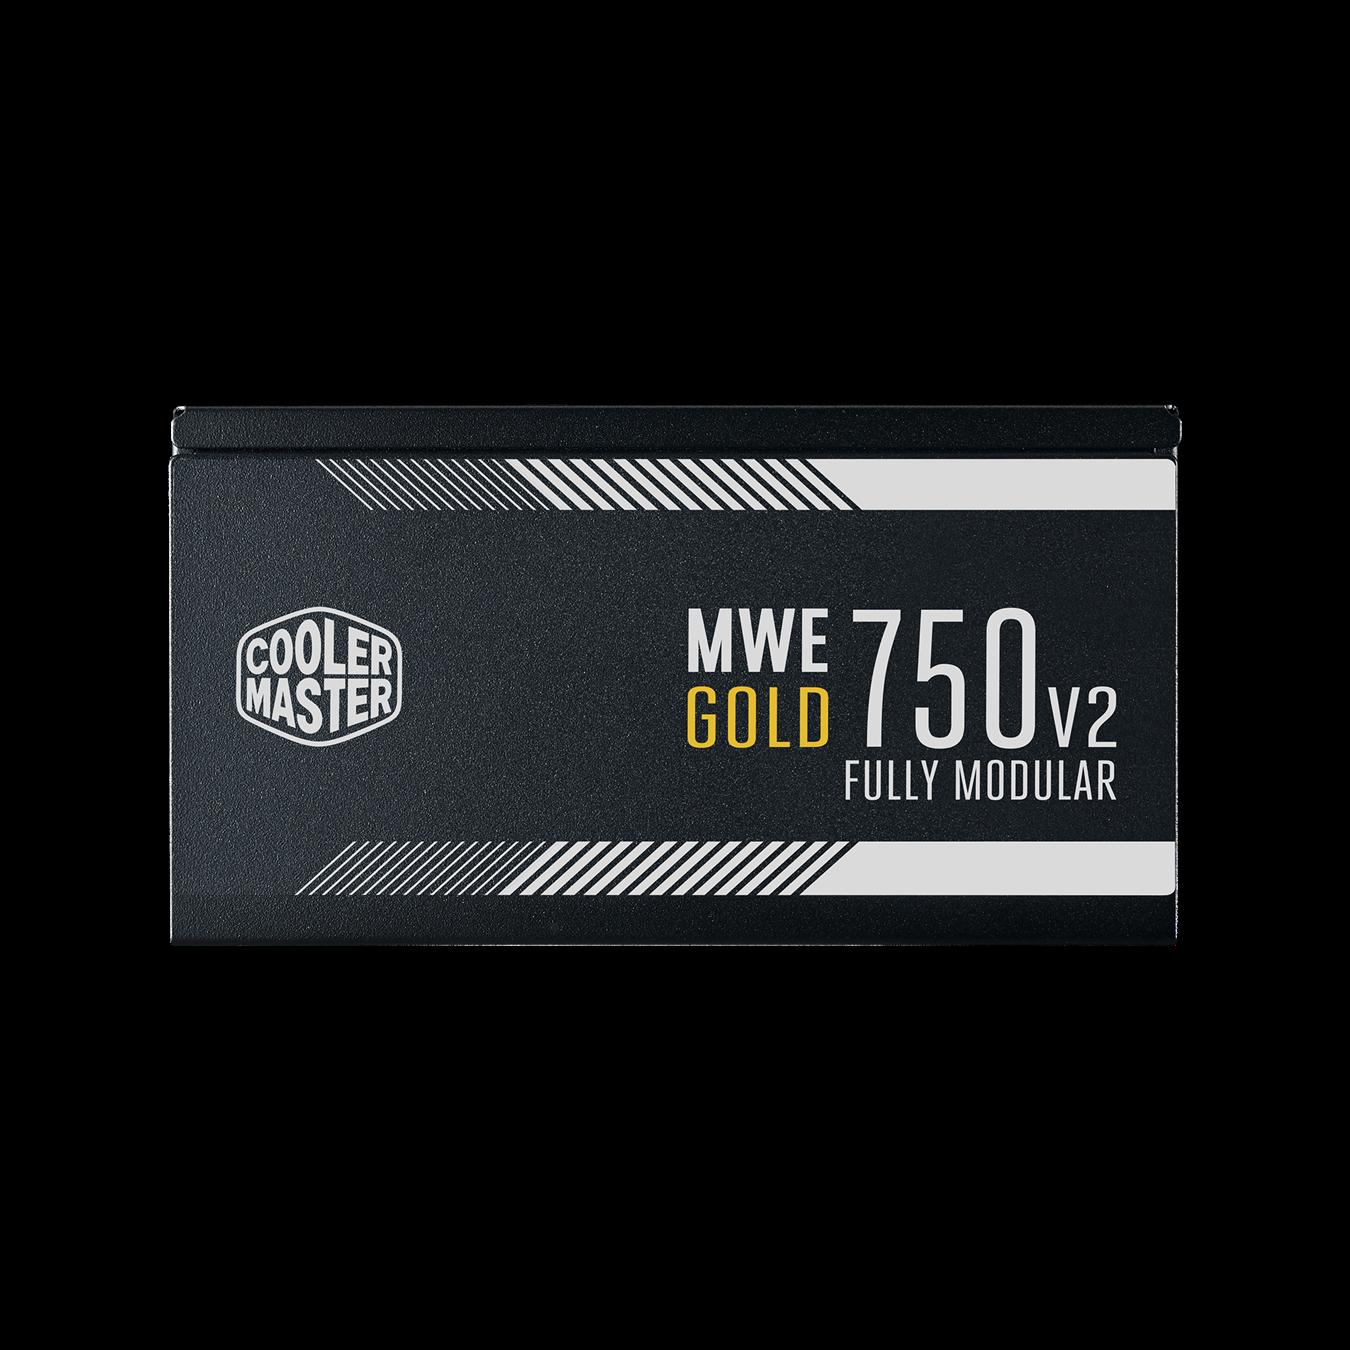 Cooler Master Power Supplies Mwe Gold Fully Modular 750w V2.